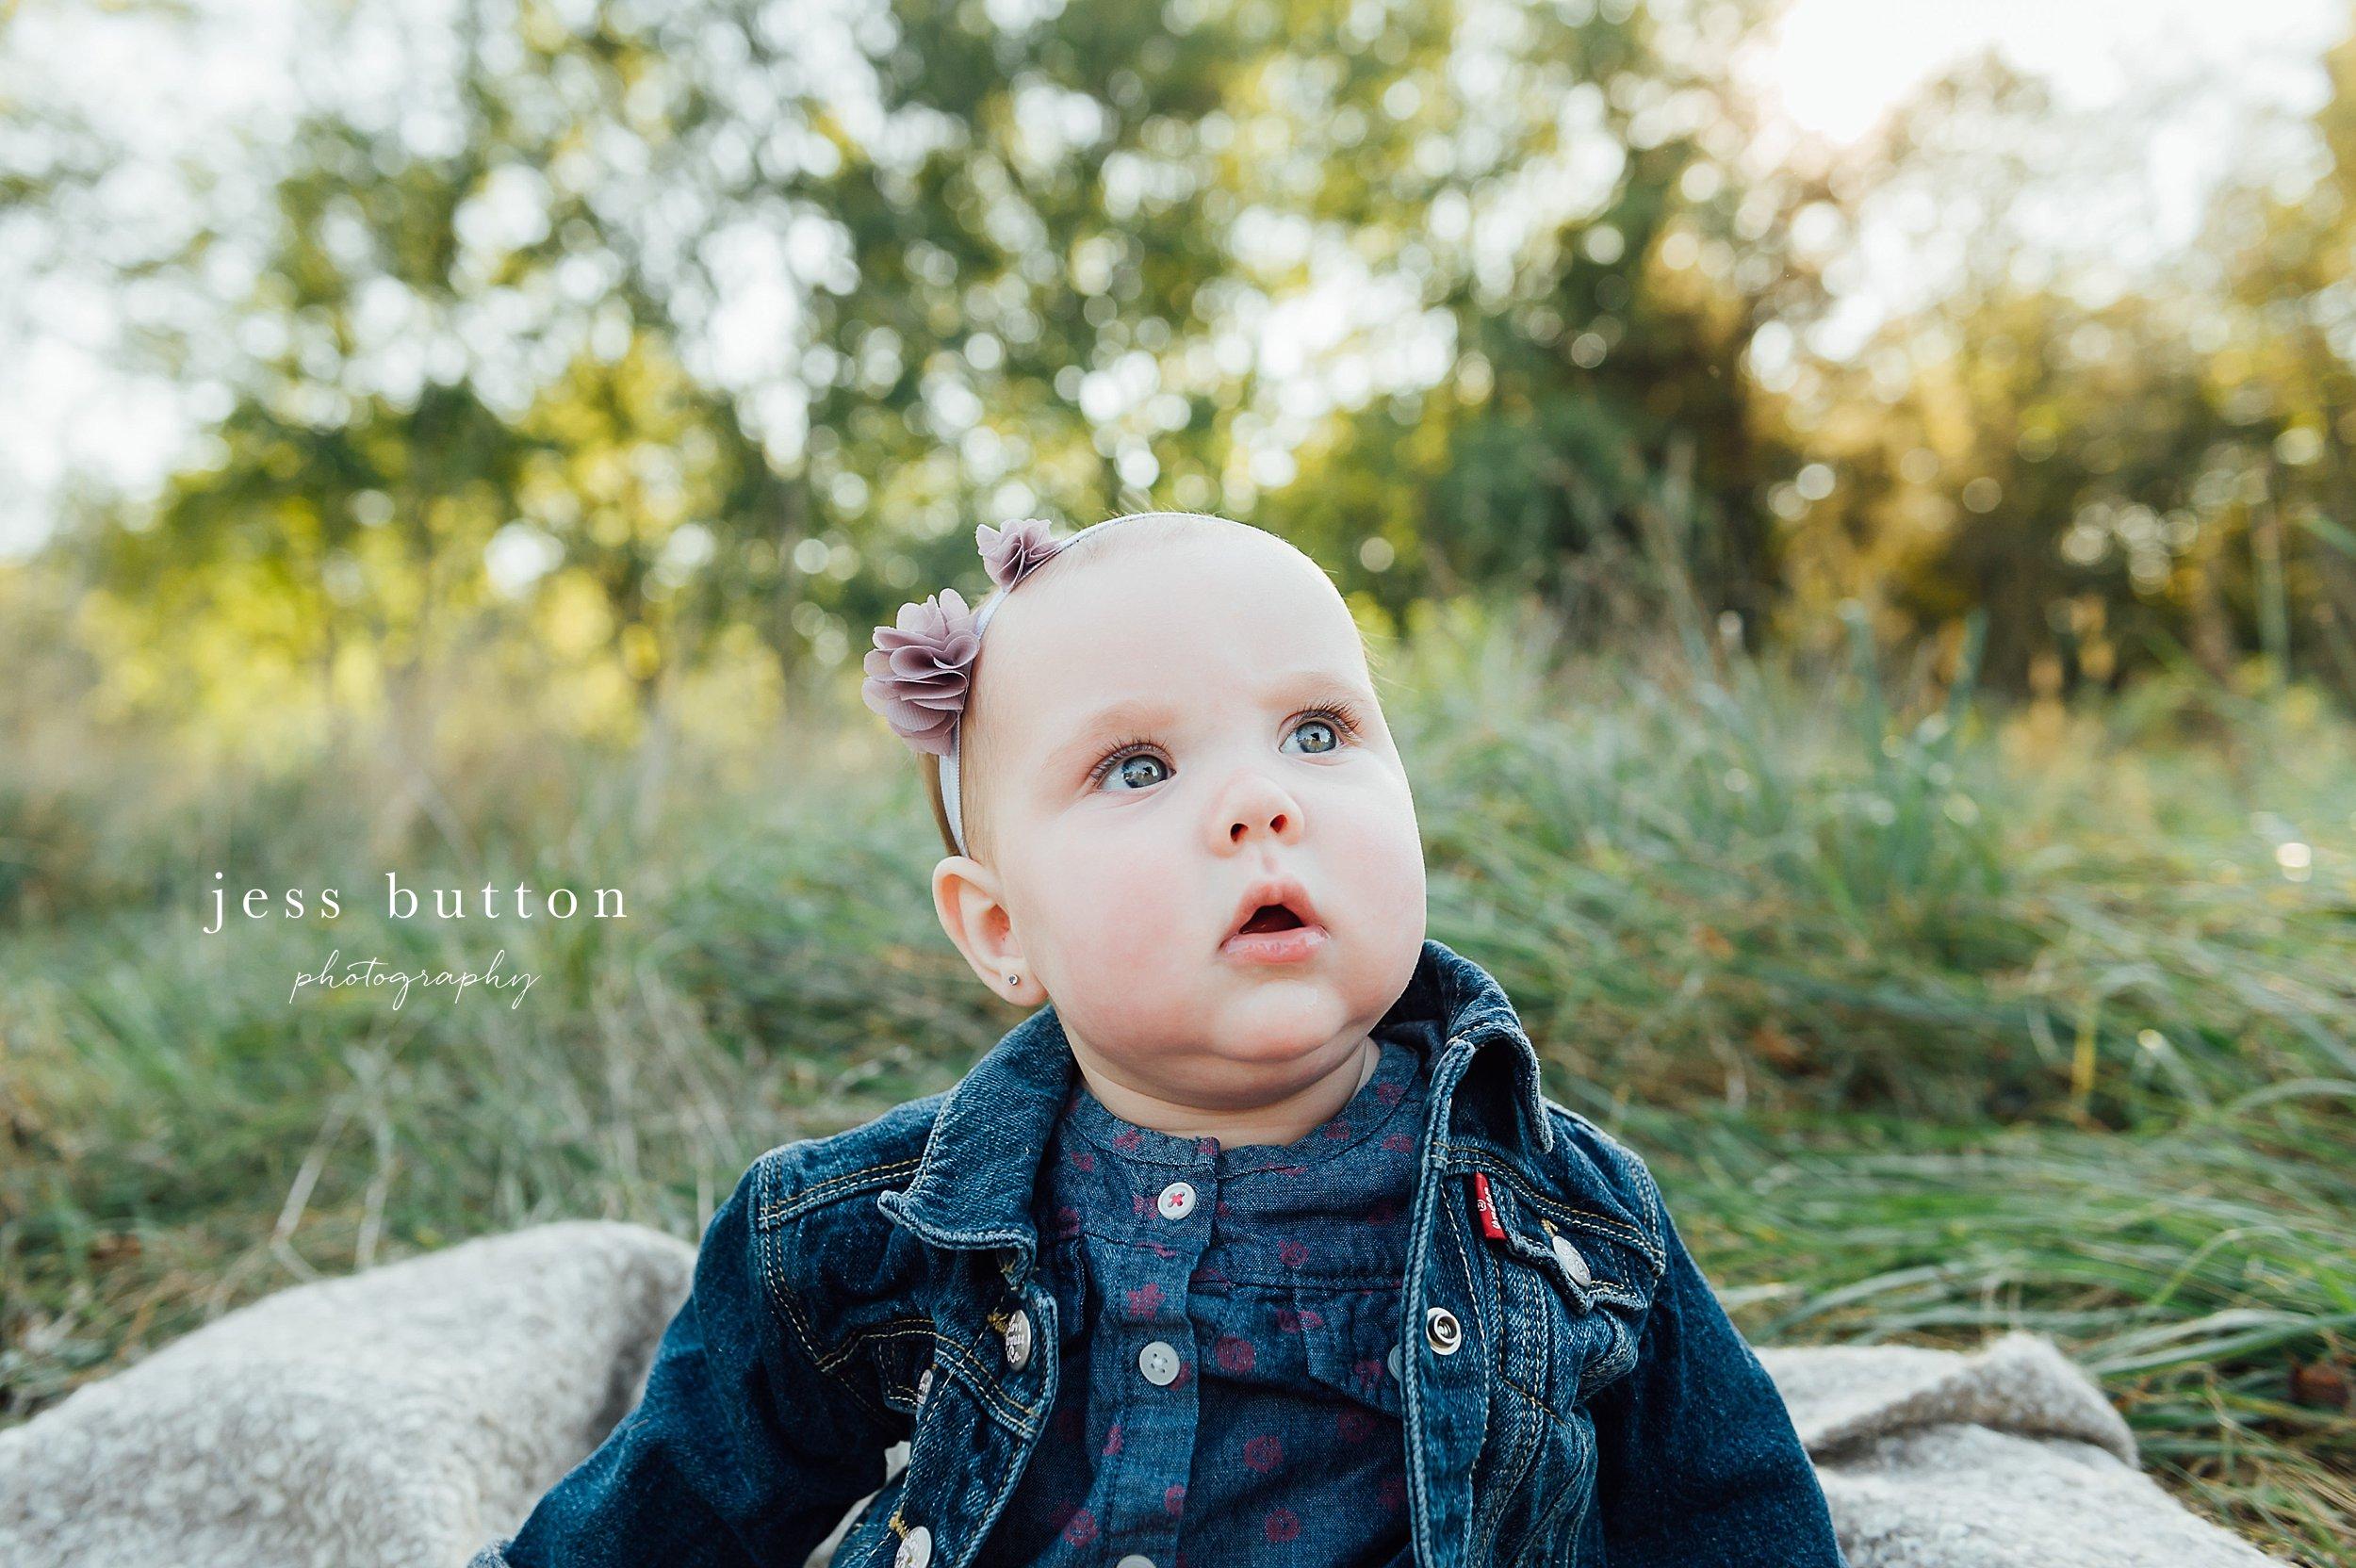 Niagara Family Photographer - Fall family portraits Niagara-on-the-Lake - 10 month old baby girl